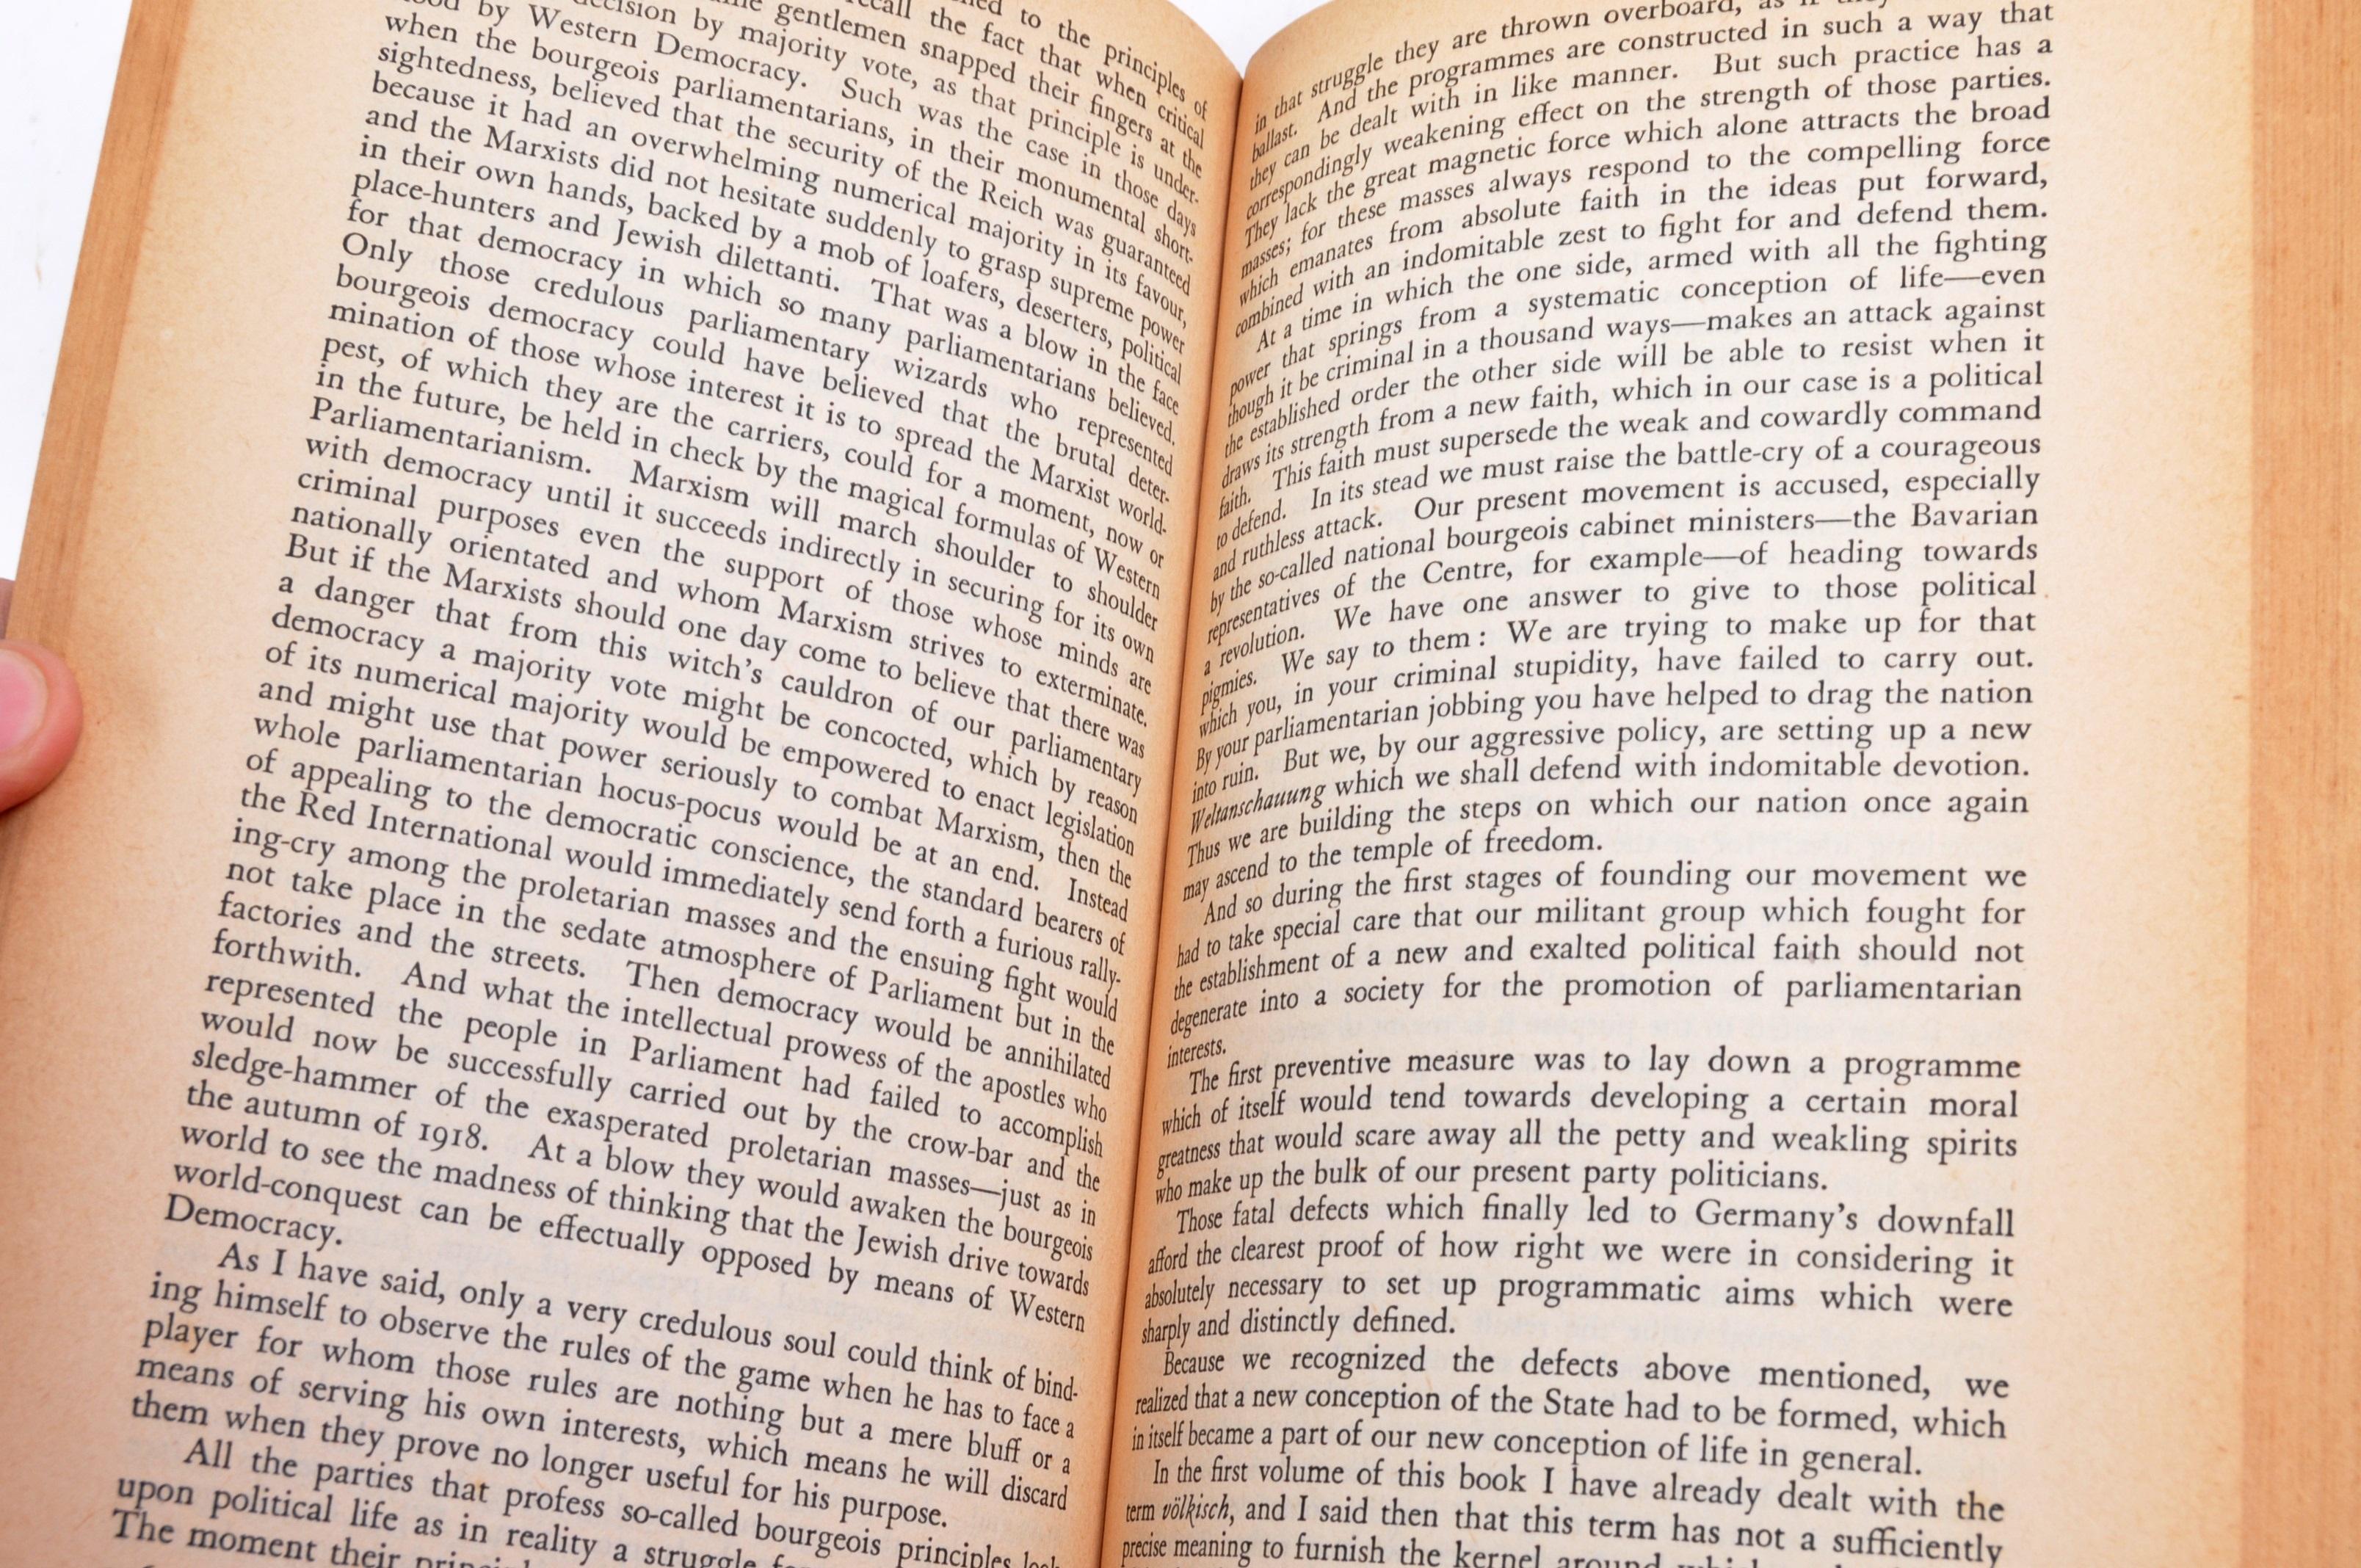 ADOLF HITLER - MEIN KAMPF - 1ST ENGLISH EDITION 1939 - Image 6 of 9